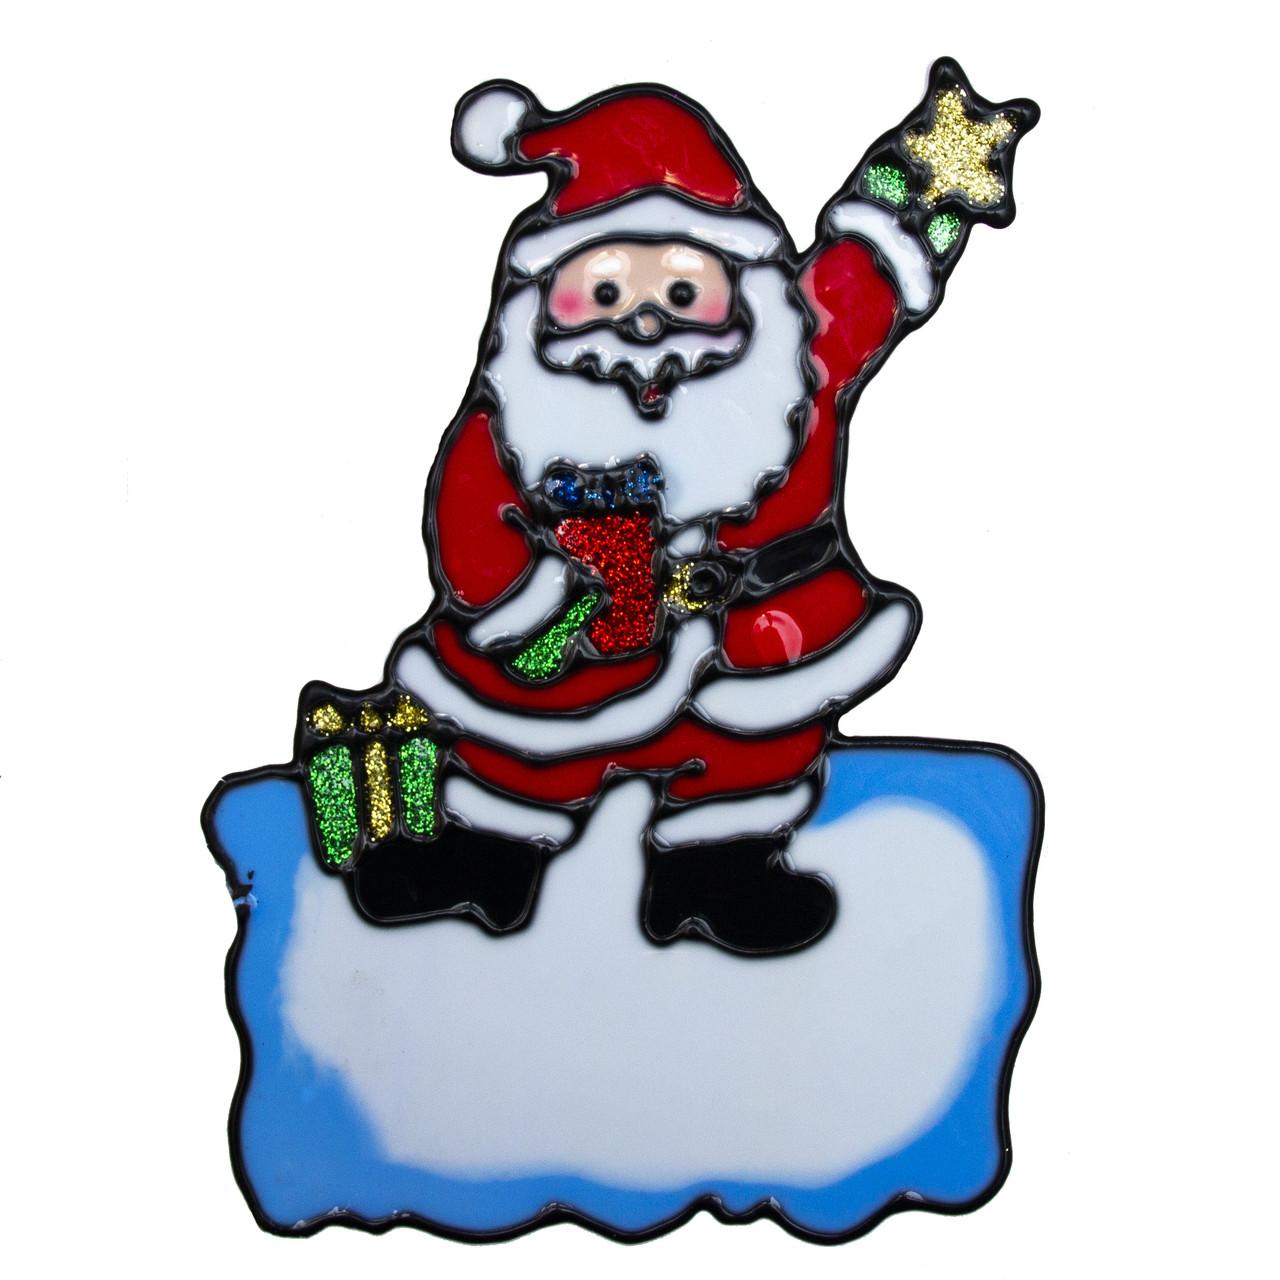 Новогодняя наклейка на окно, 14*19см, Дед Мороз на снегу, (000548-8)